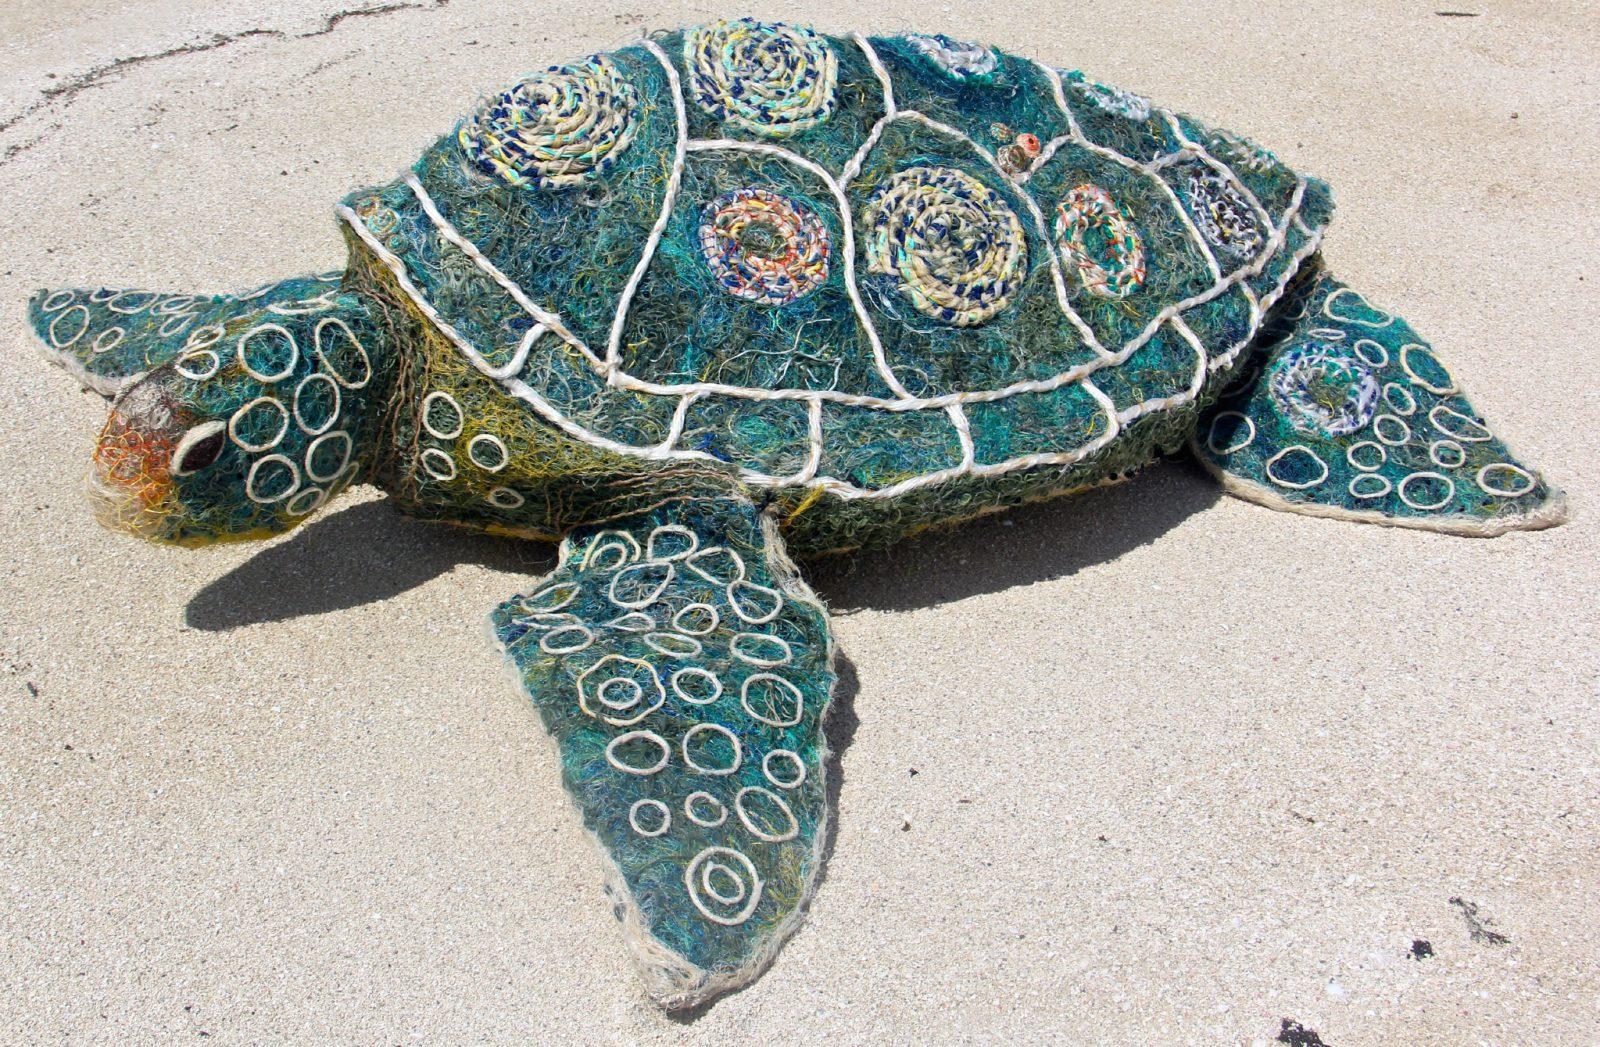 Oeuvre Collaborative /Emarr la tortue, 2017.Filets de pêche recyclés